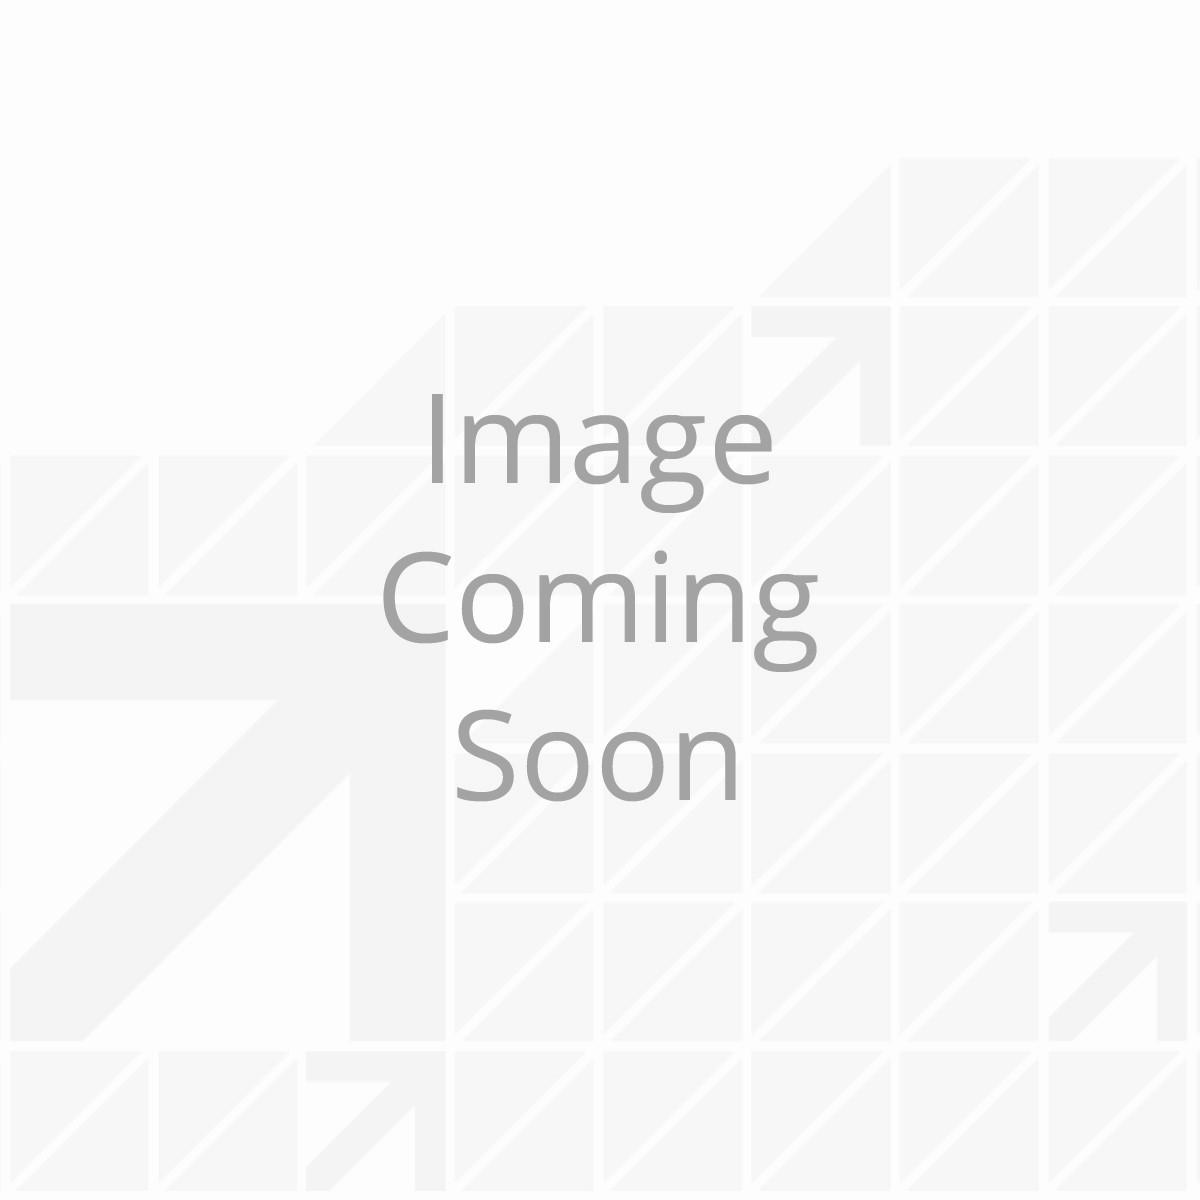 "2-5/16"" A-Frame Coupler with Sleeve-Lock (12,500 lbs., Black)"